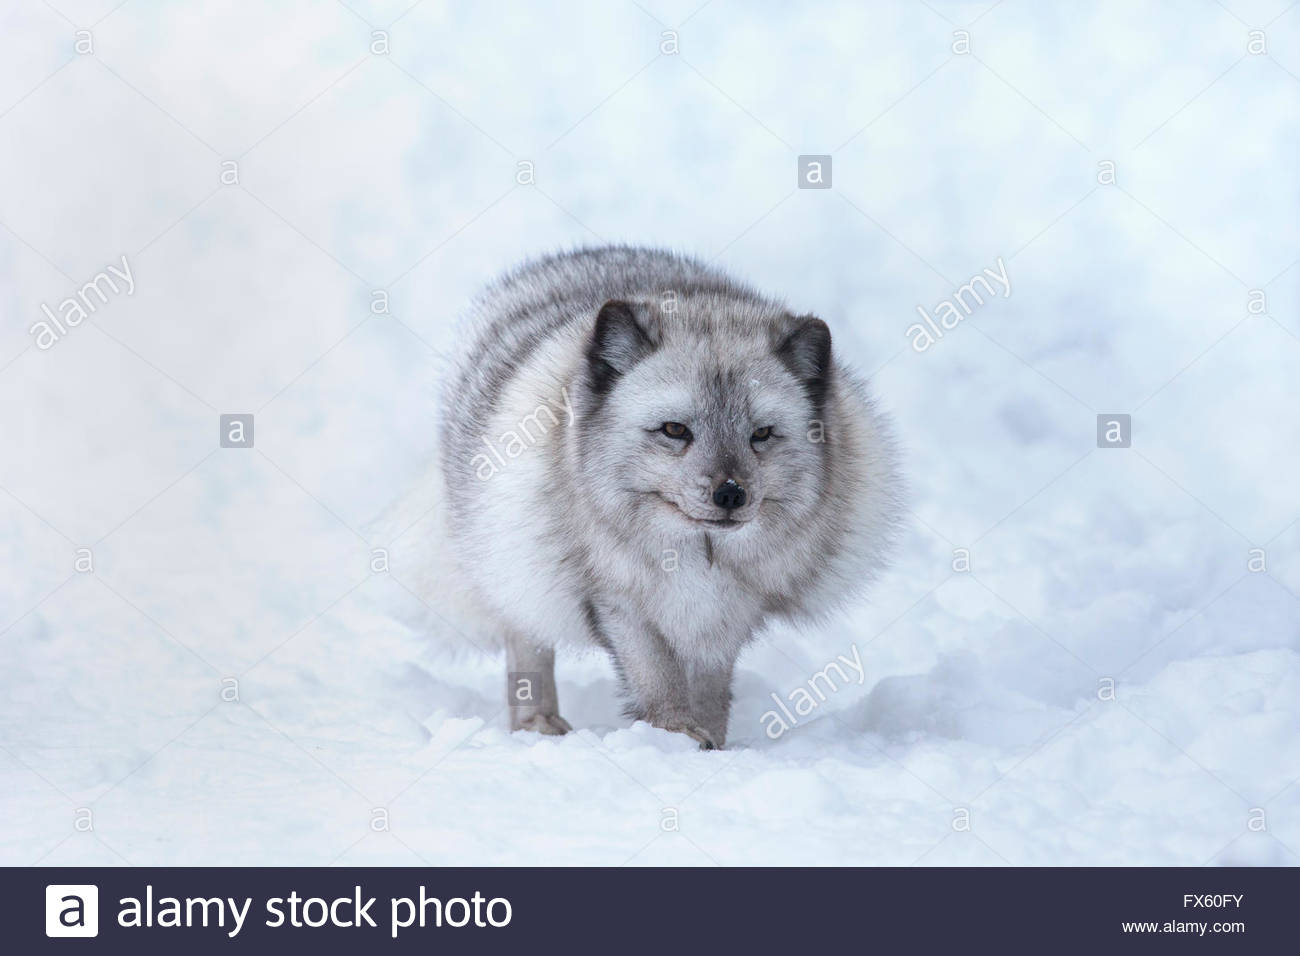 Arctic fox vixen (Vulpes lagopus), captive, Highland Wildlife Park, Kingussie, Scottish Highlands, UK Stock Photo